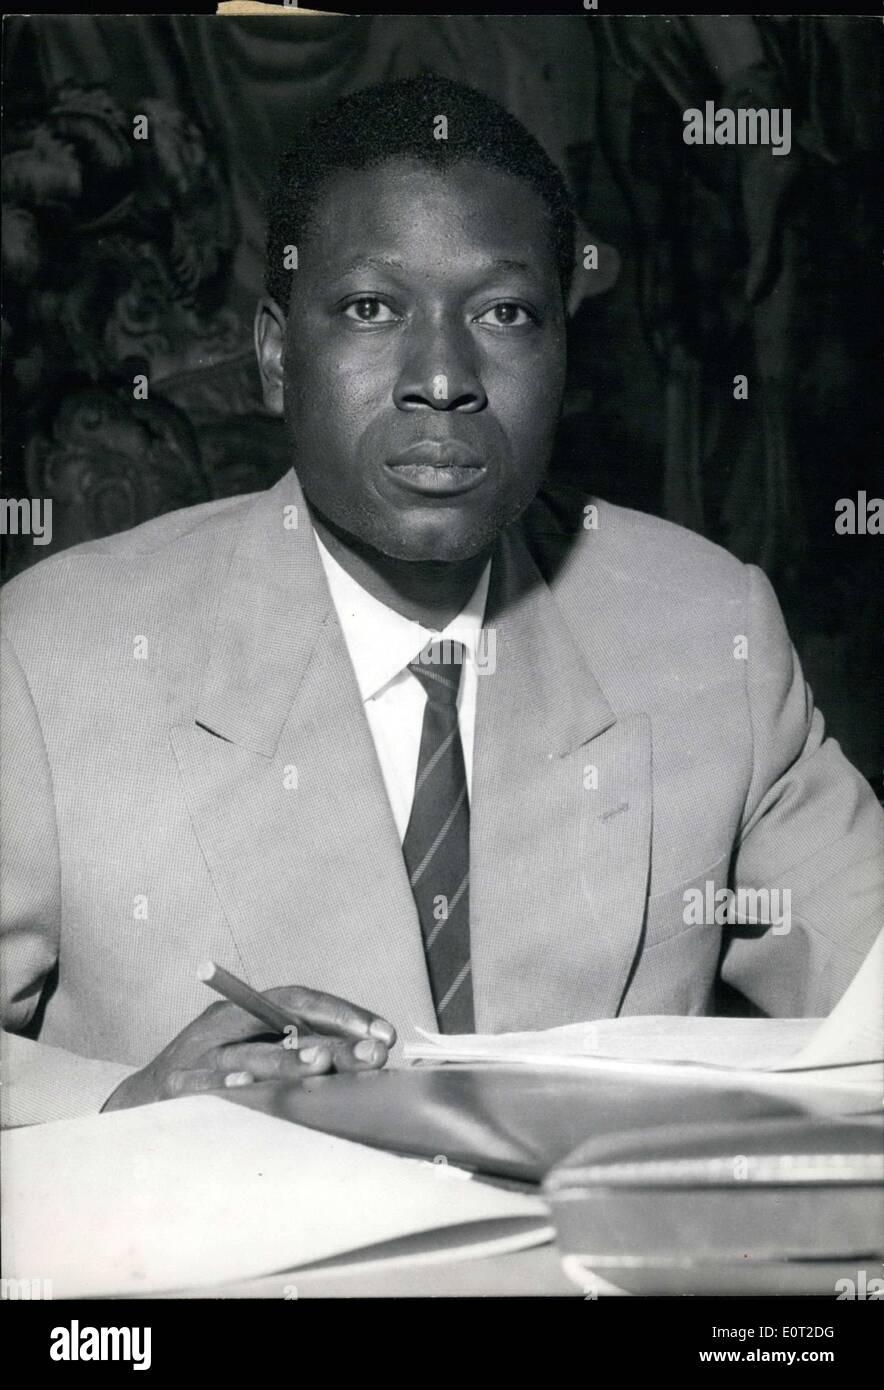 Jul. 15, 1960 - Mali's government just designated Mr. Abdoulaye Maiga as a representative of Mali in Paris. Maiga, who has just - Stock Image